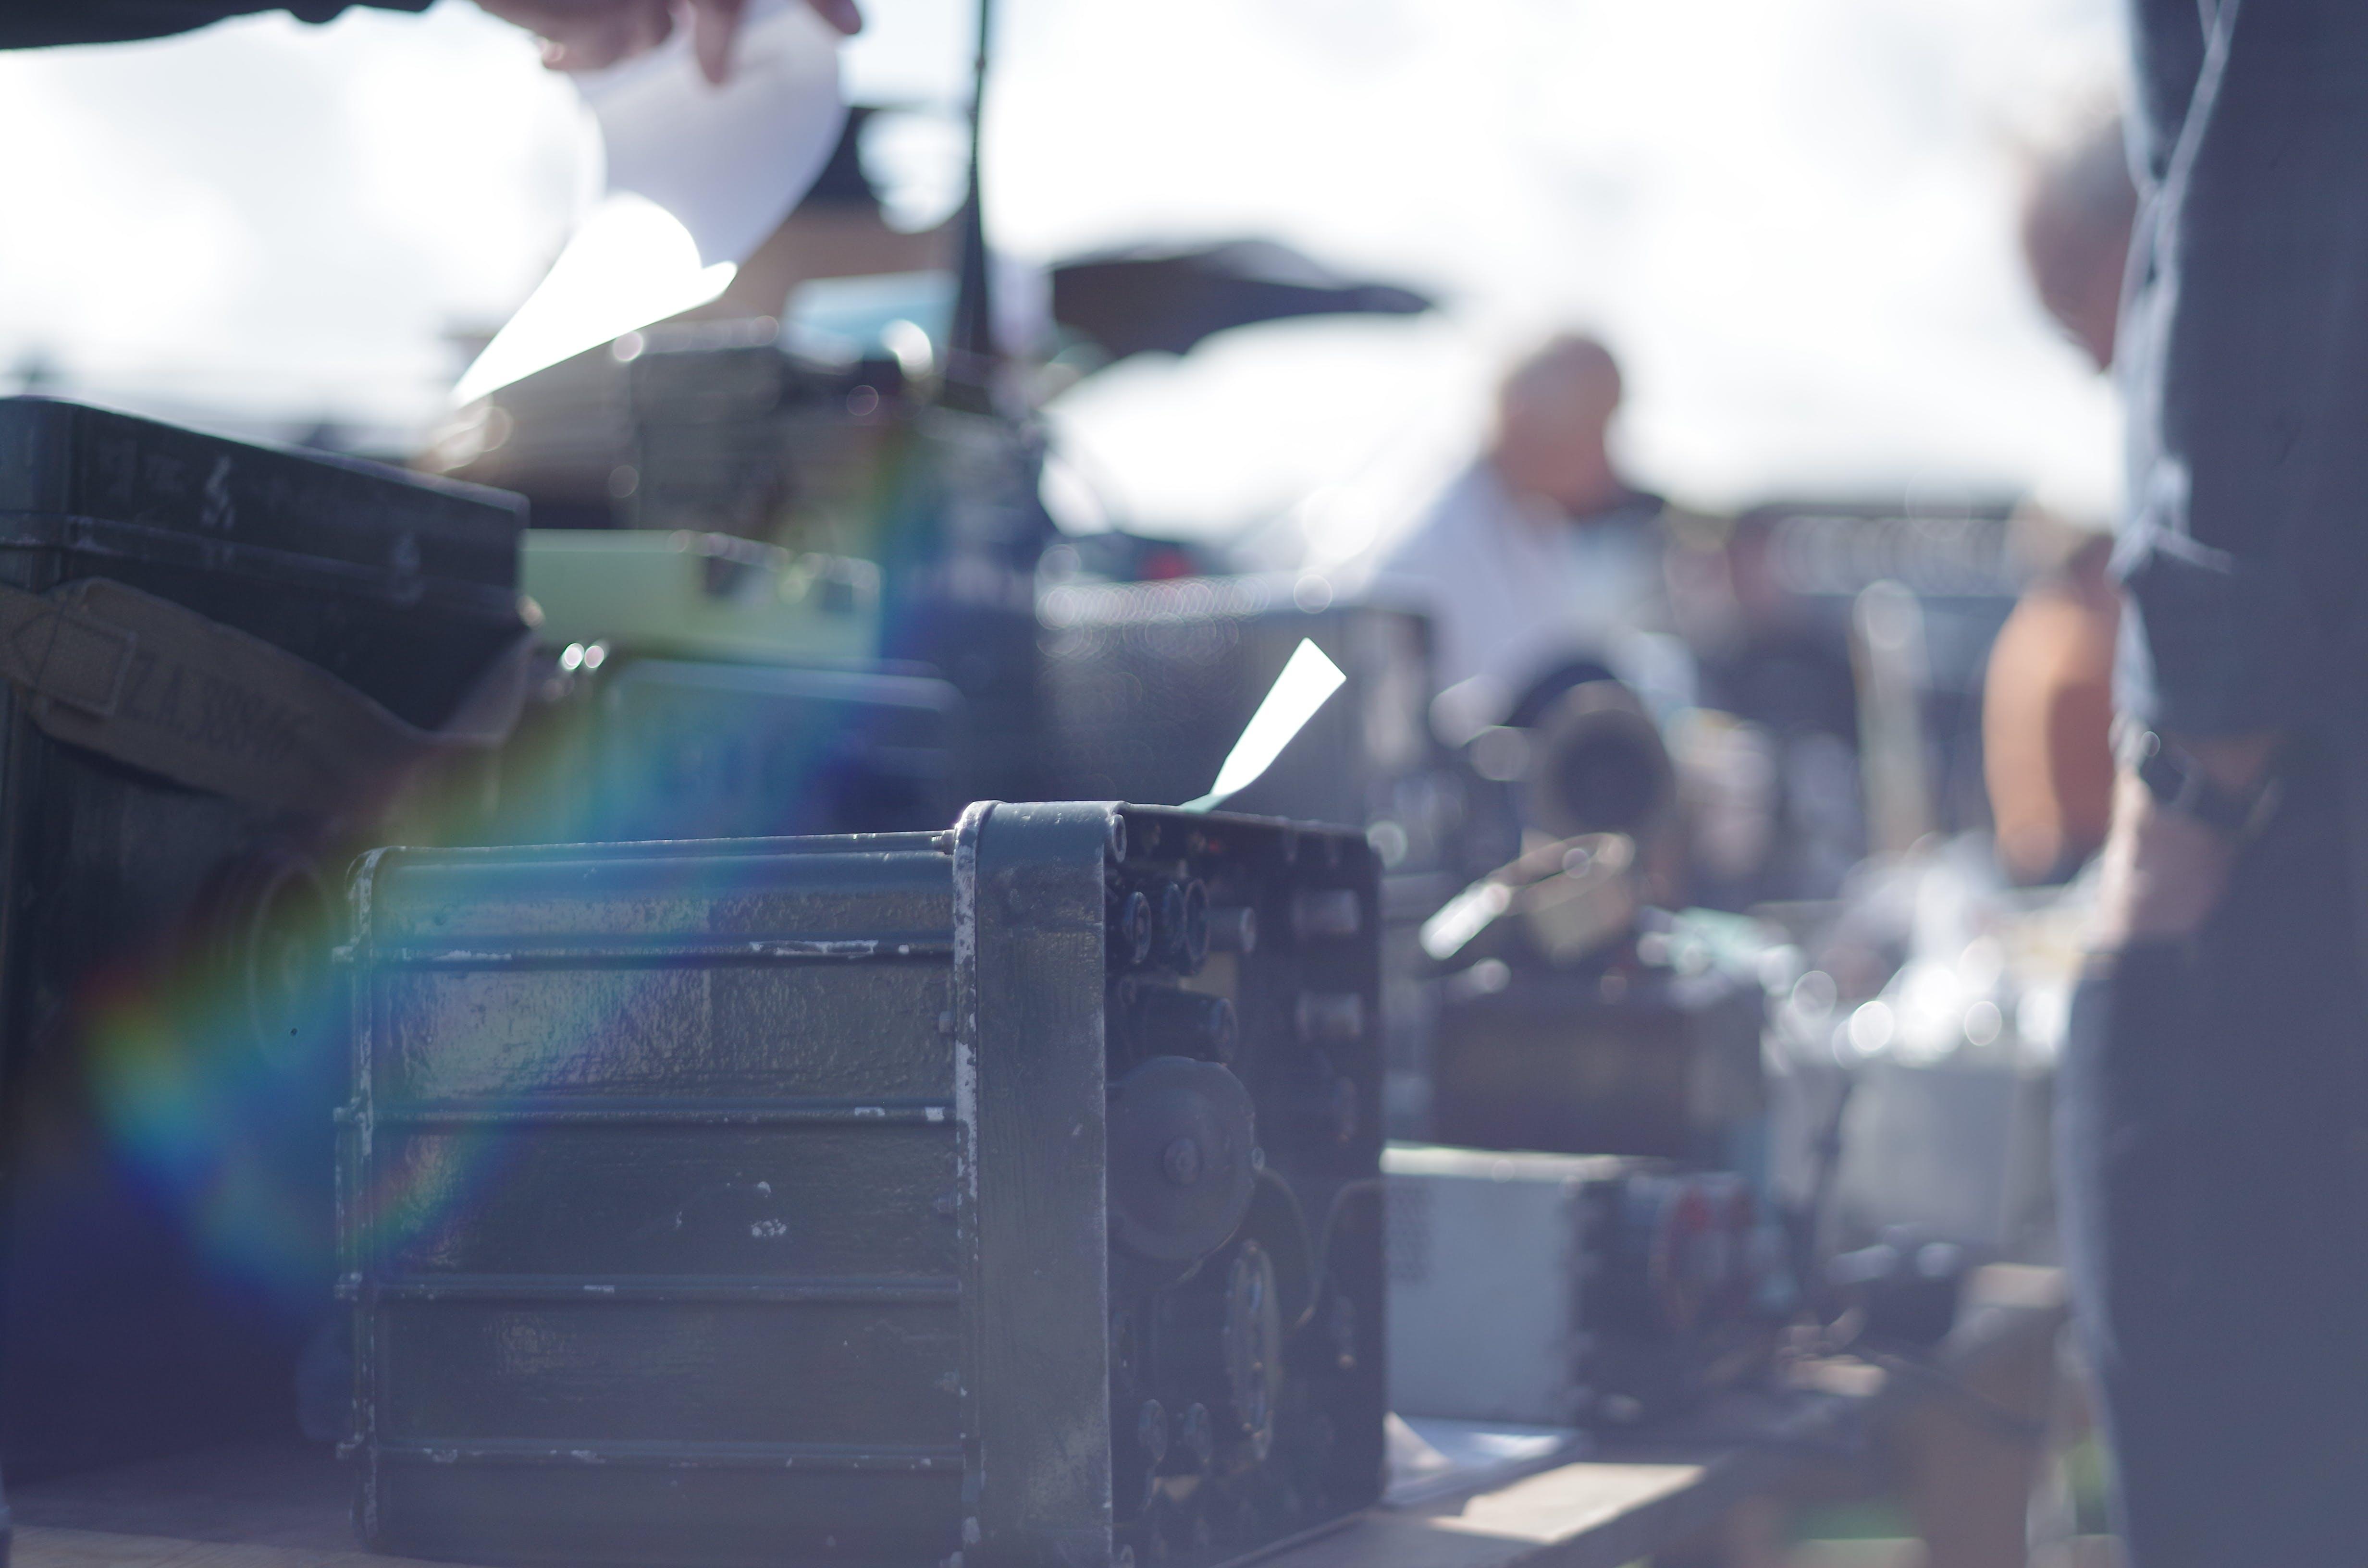 Free stock photo of amateur radio, military, old radios, radio